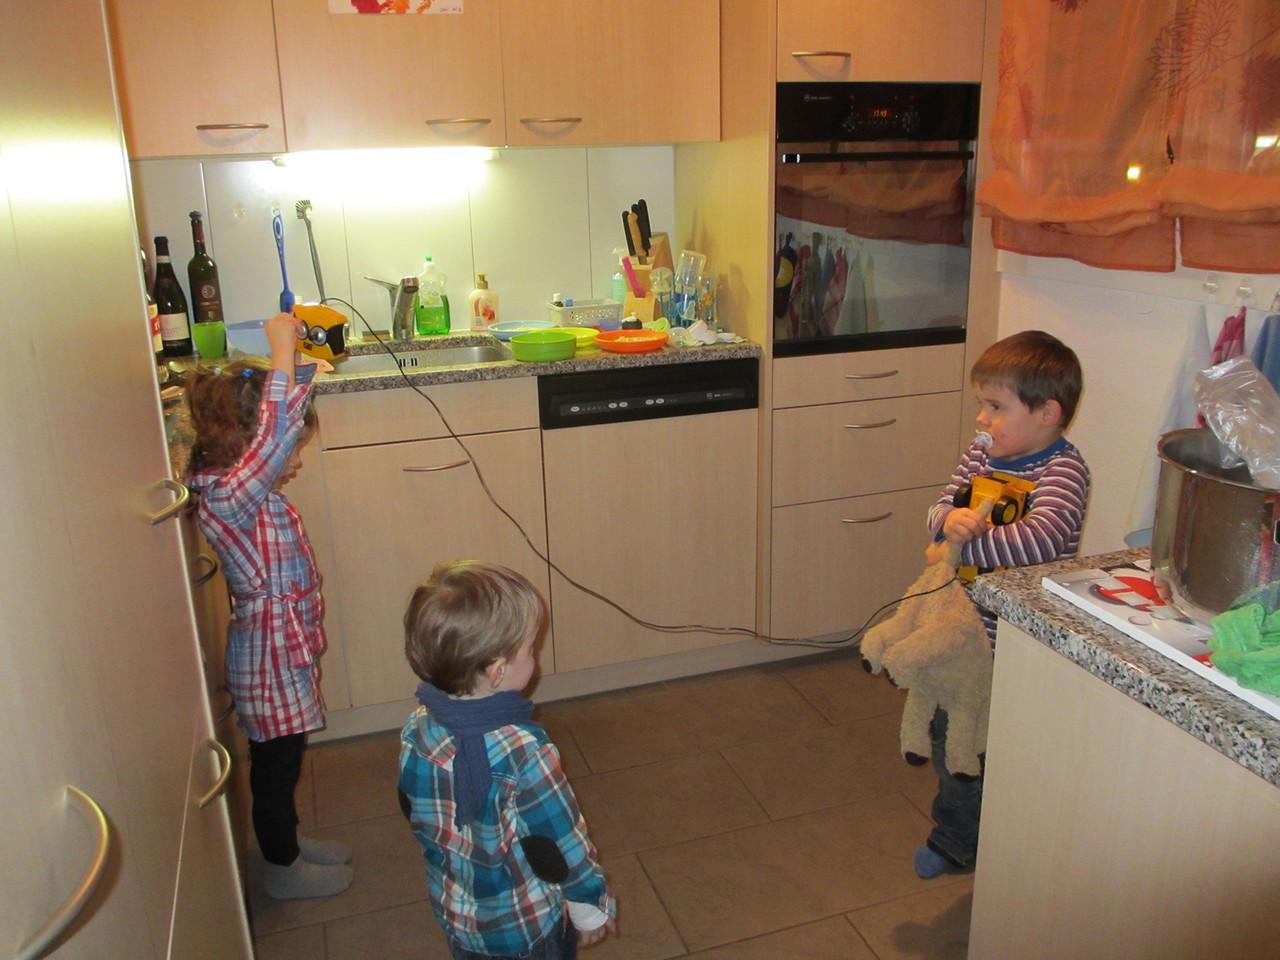 Unsere Küche - Mami's Revier